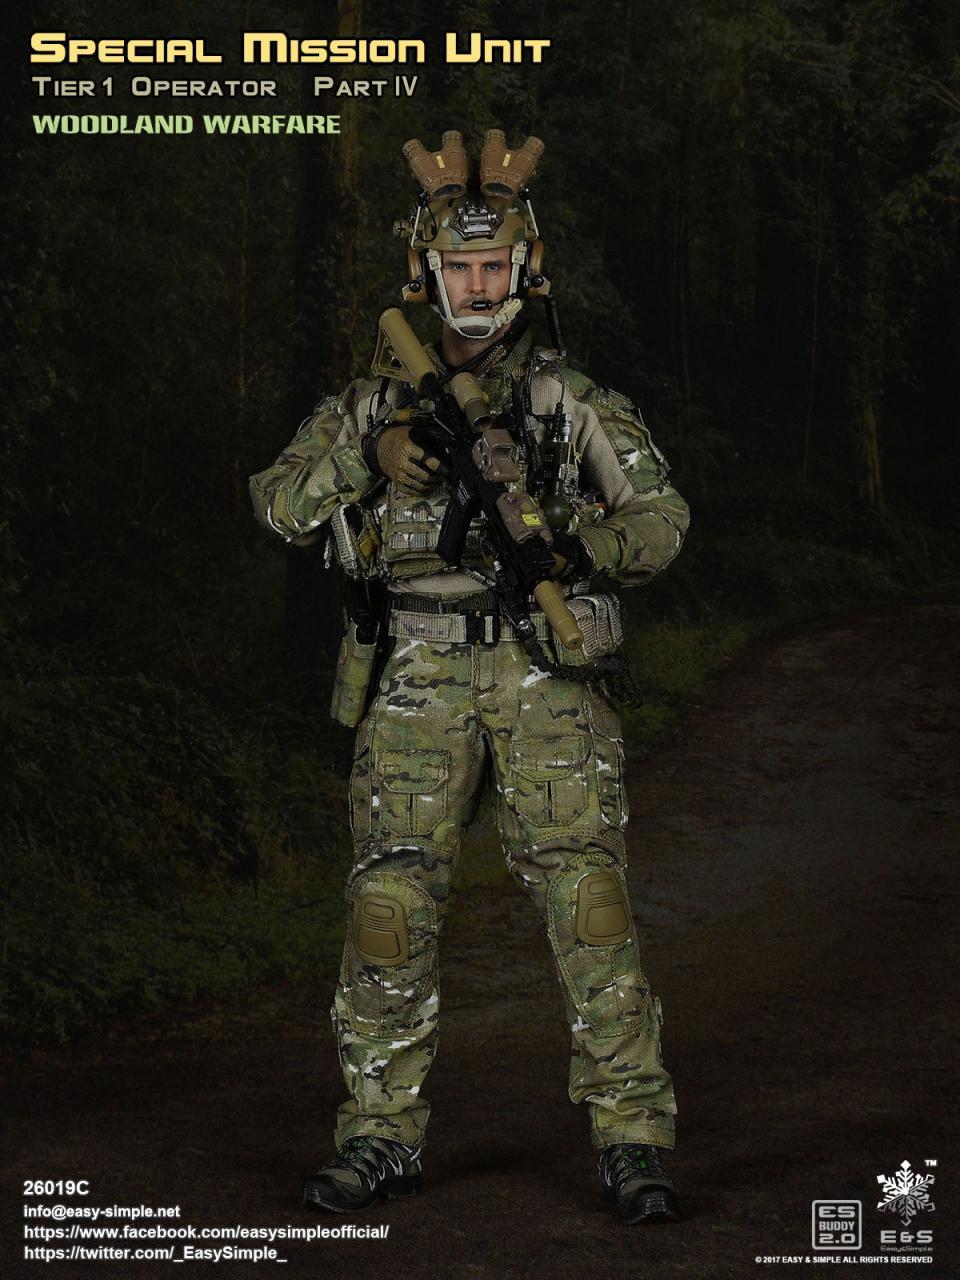 1//6 Scale Toy Urban Warfare SMU Tier 1 Operator Male Headsculpt